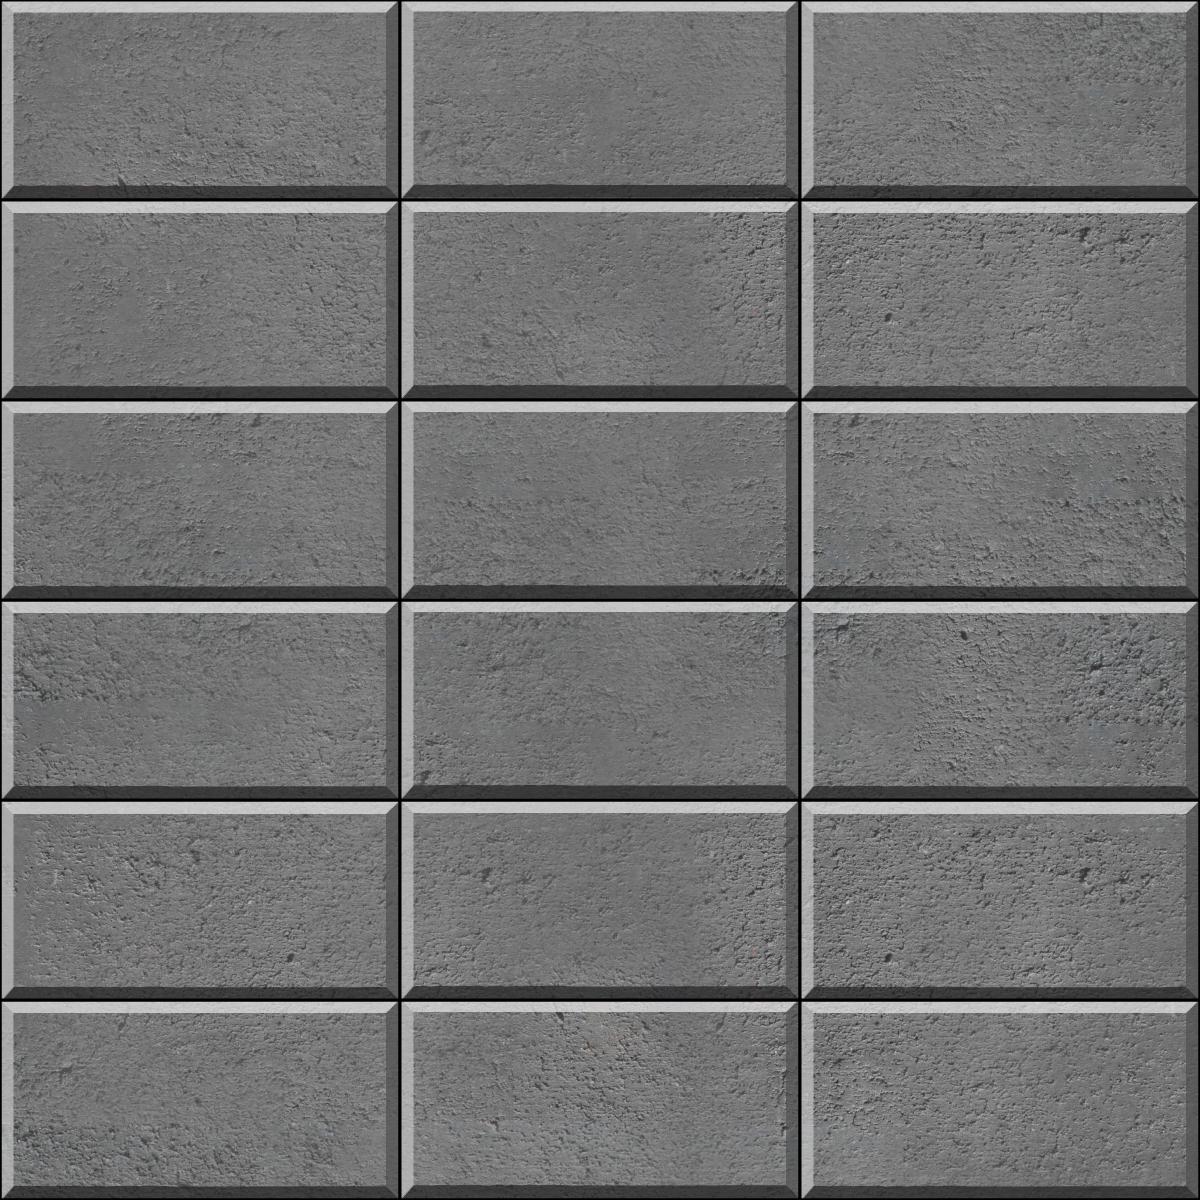 Stack Bond brick paver